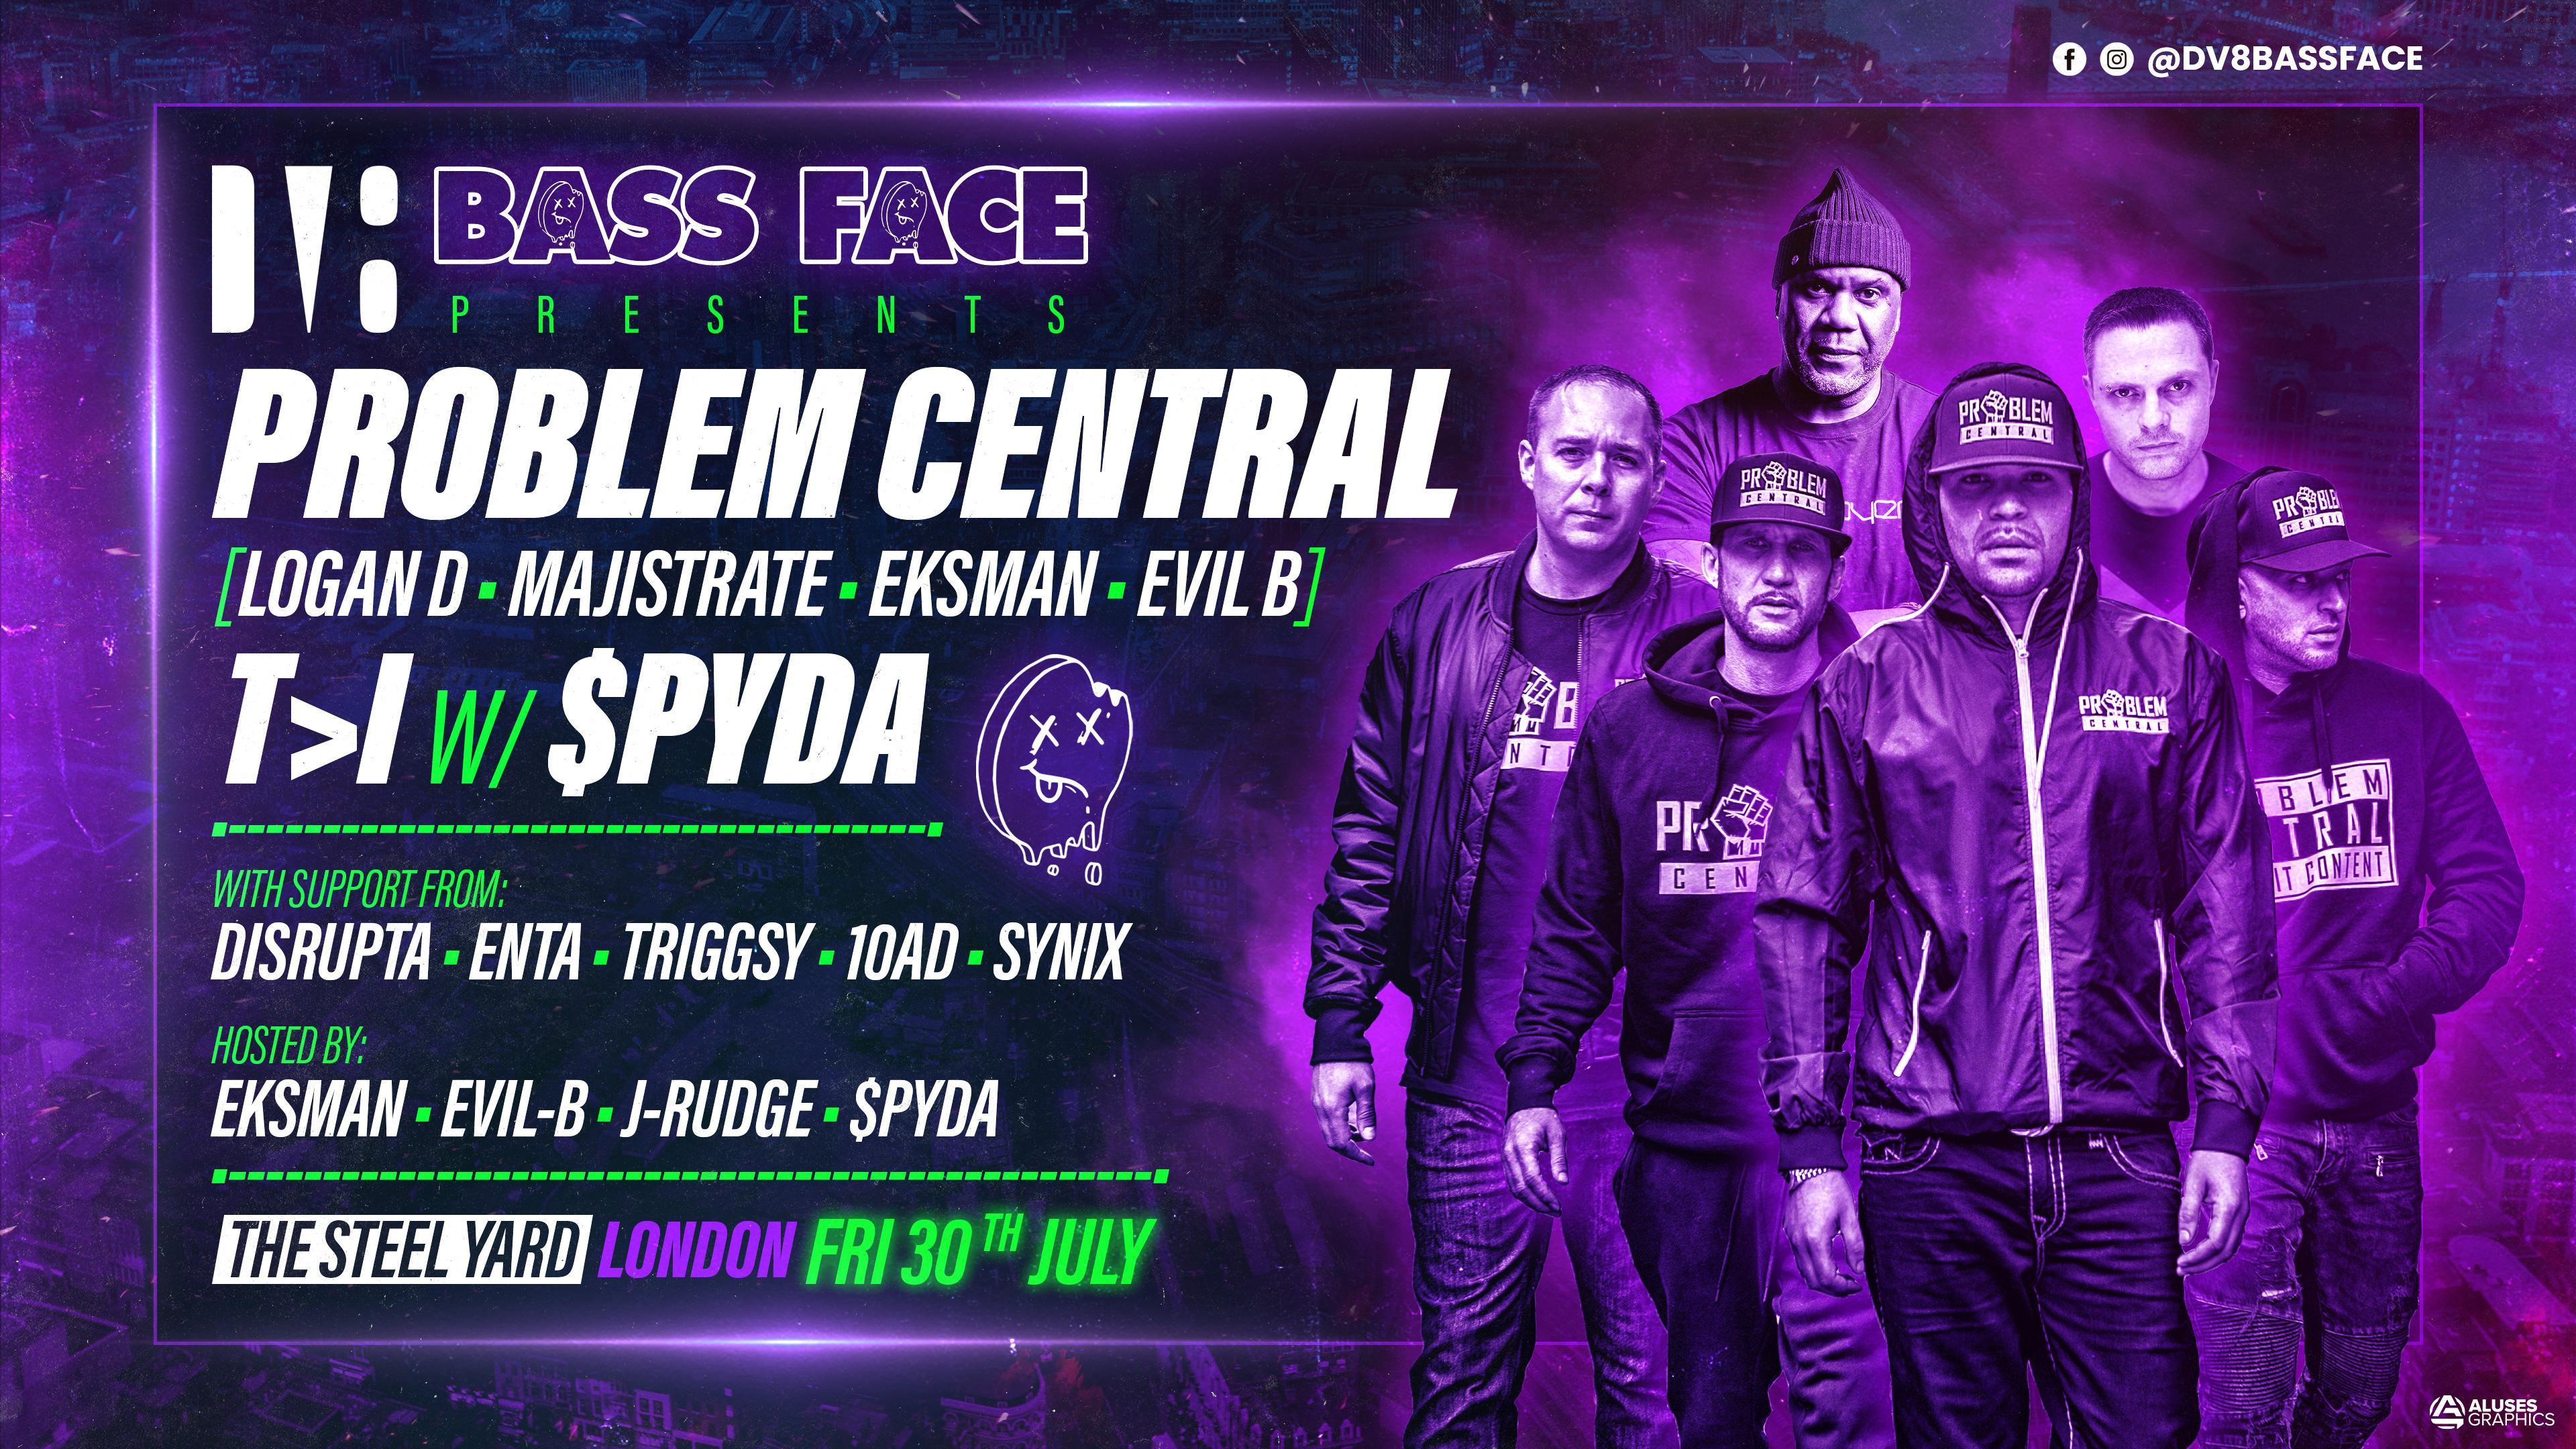 Bass Face // LDN //ProblemCentral-LoganD.Majistrate.EKSMAN.EvilB,T>I.Spyda+